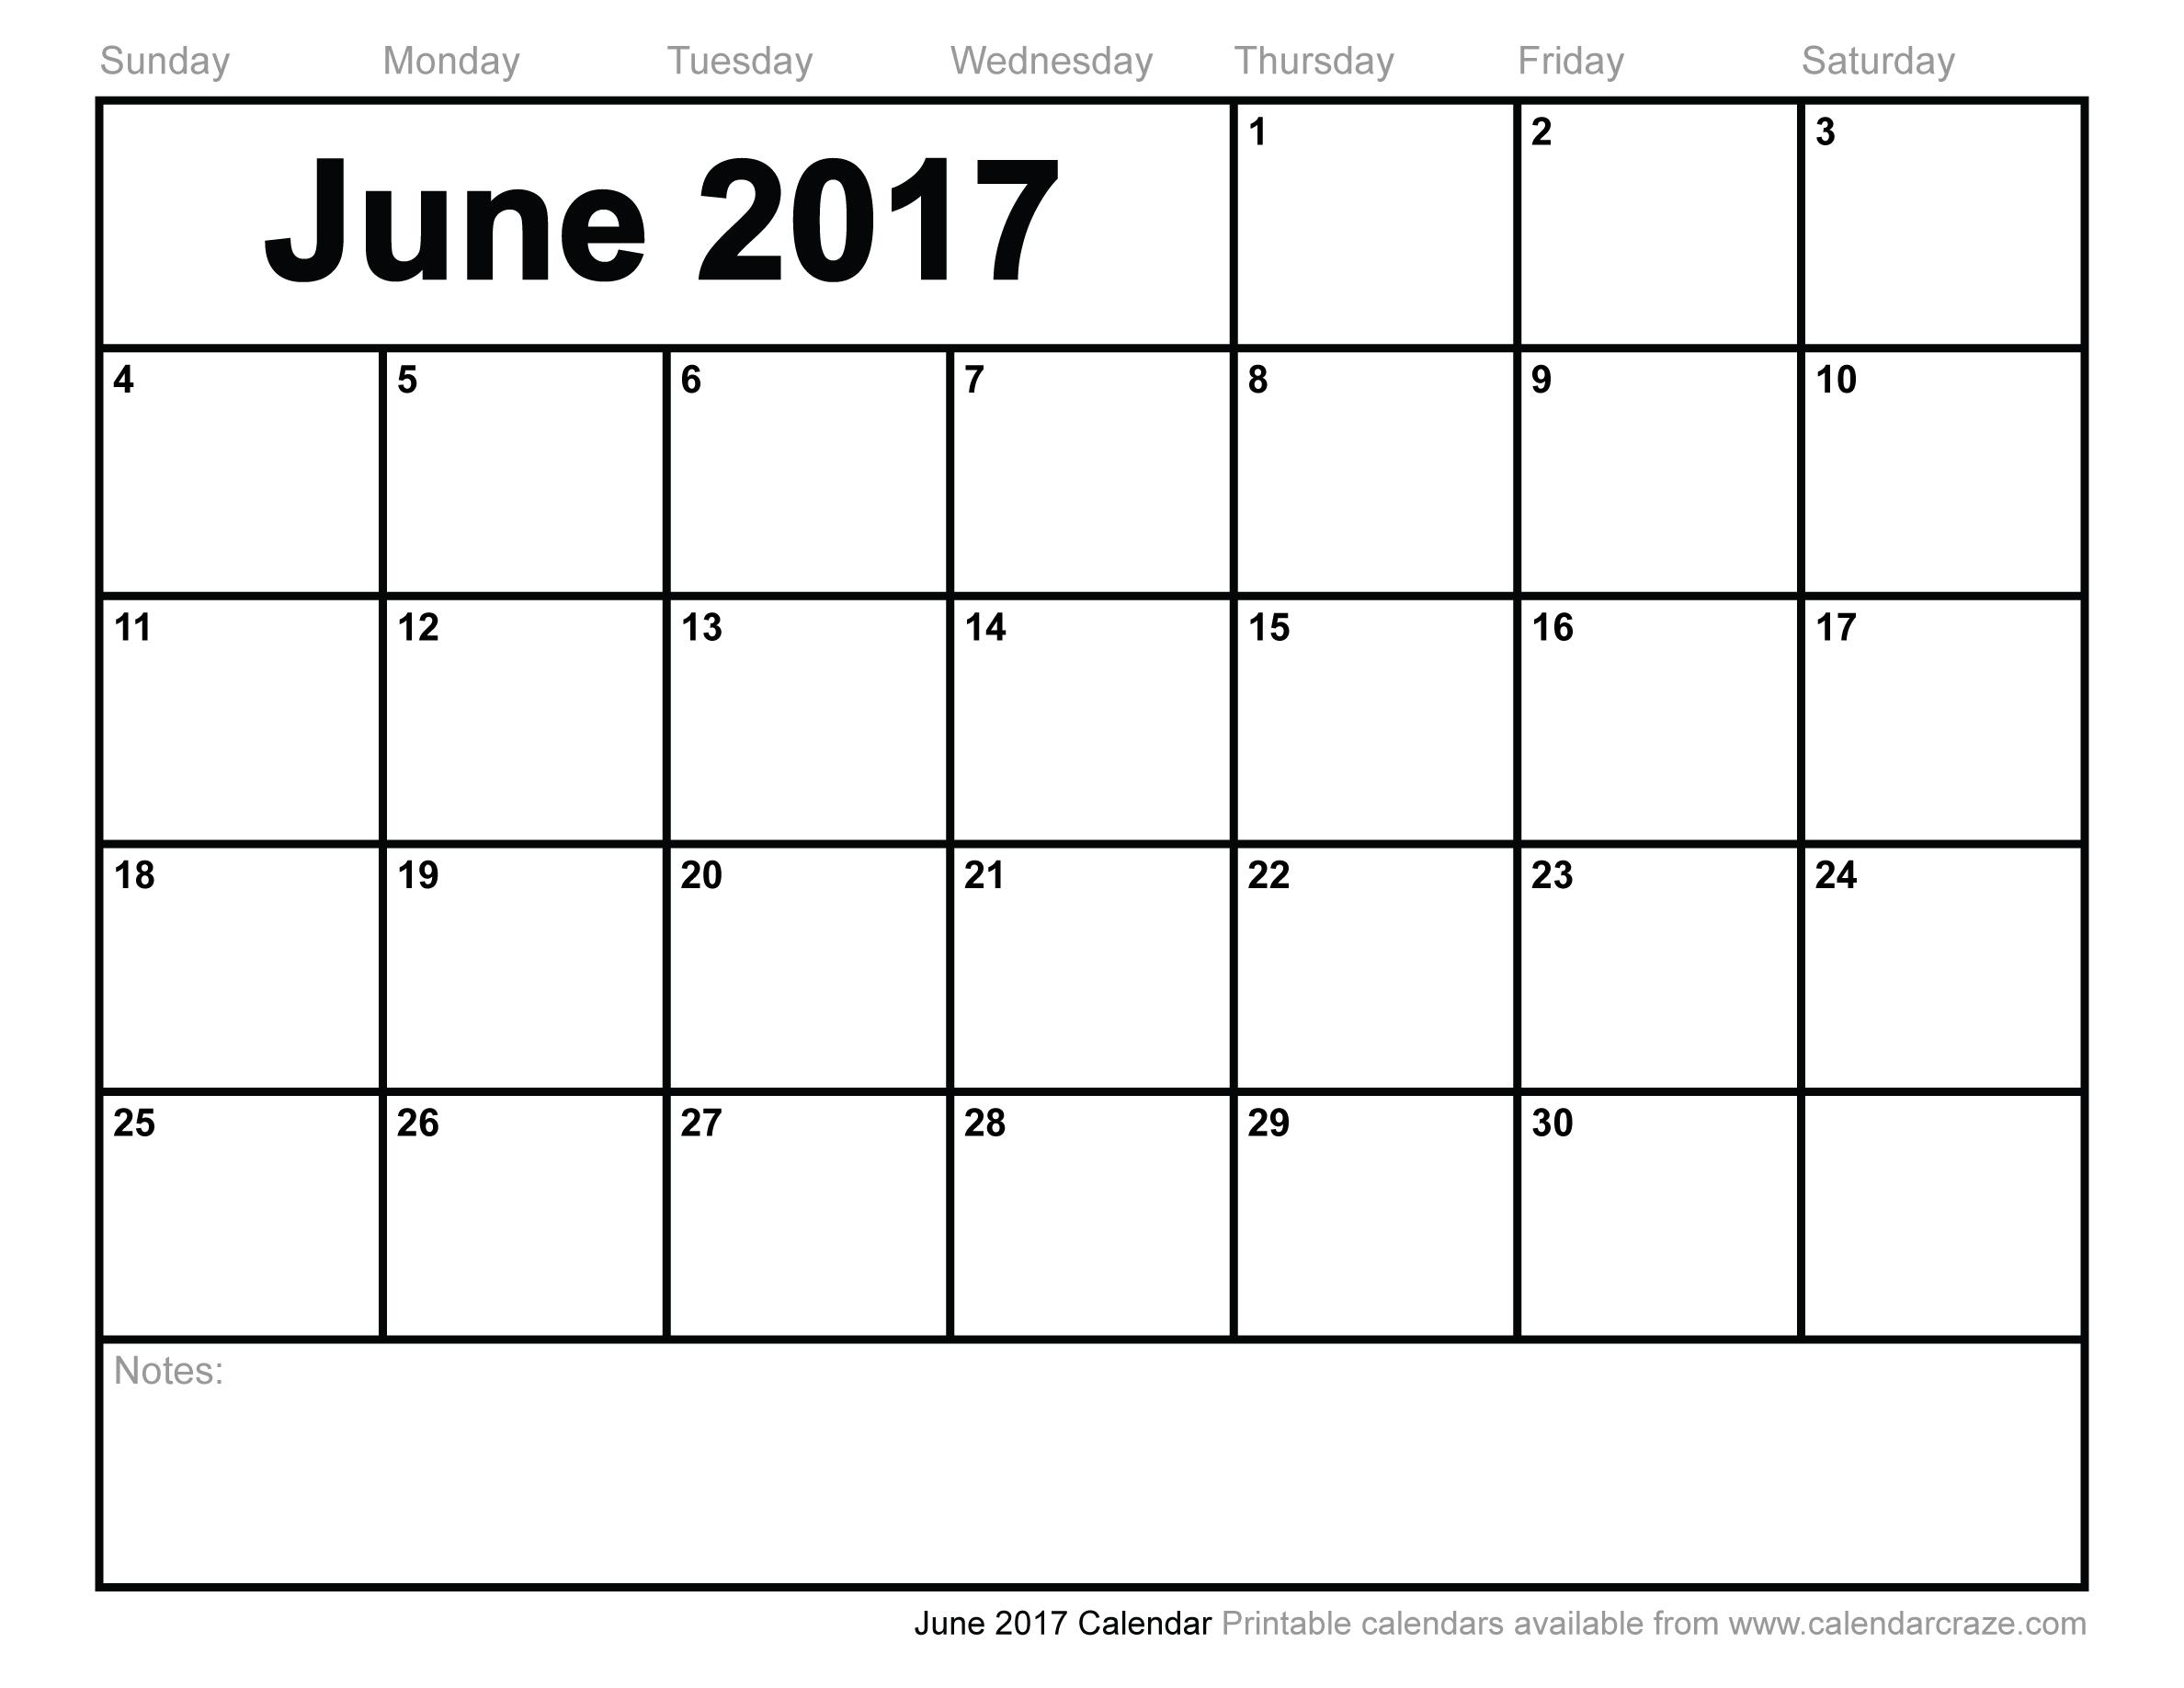 June 2017 Calendar Printable | weekly calendar template